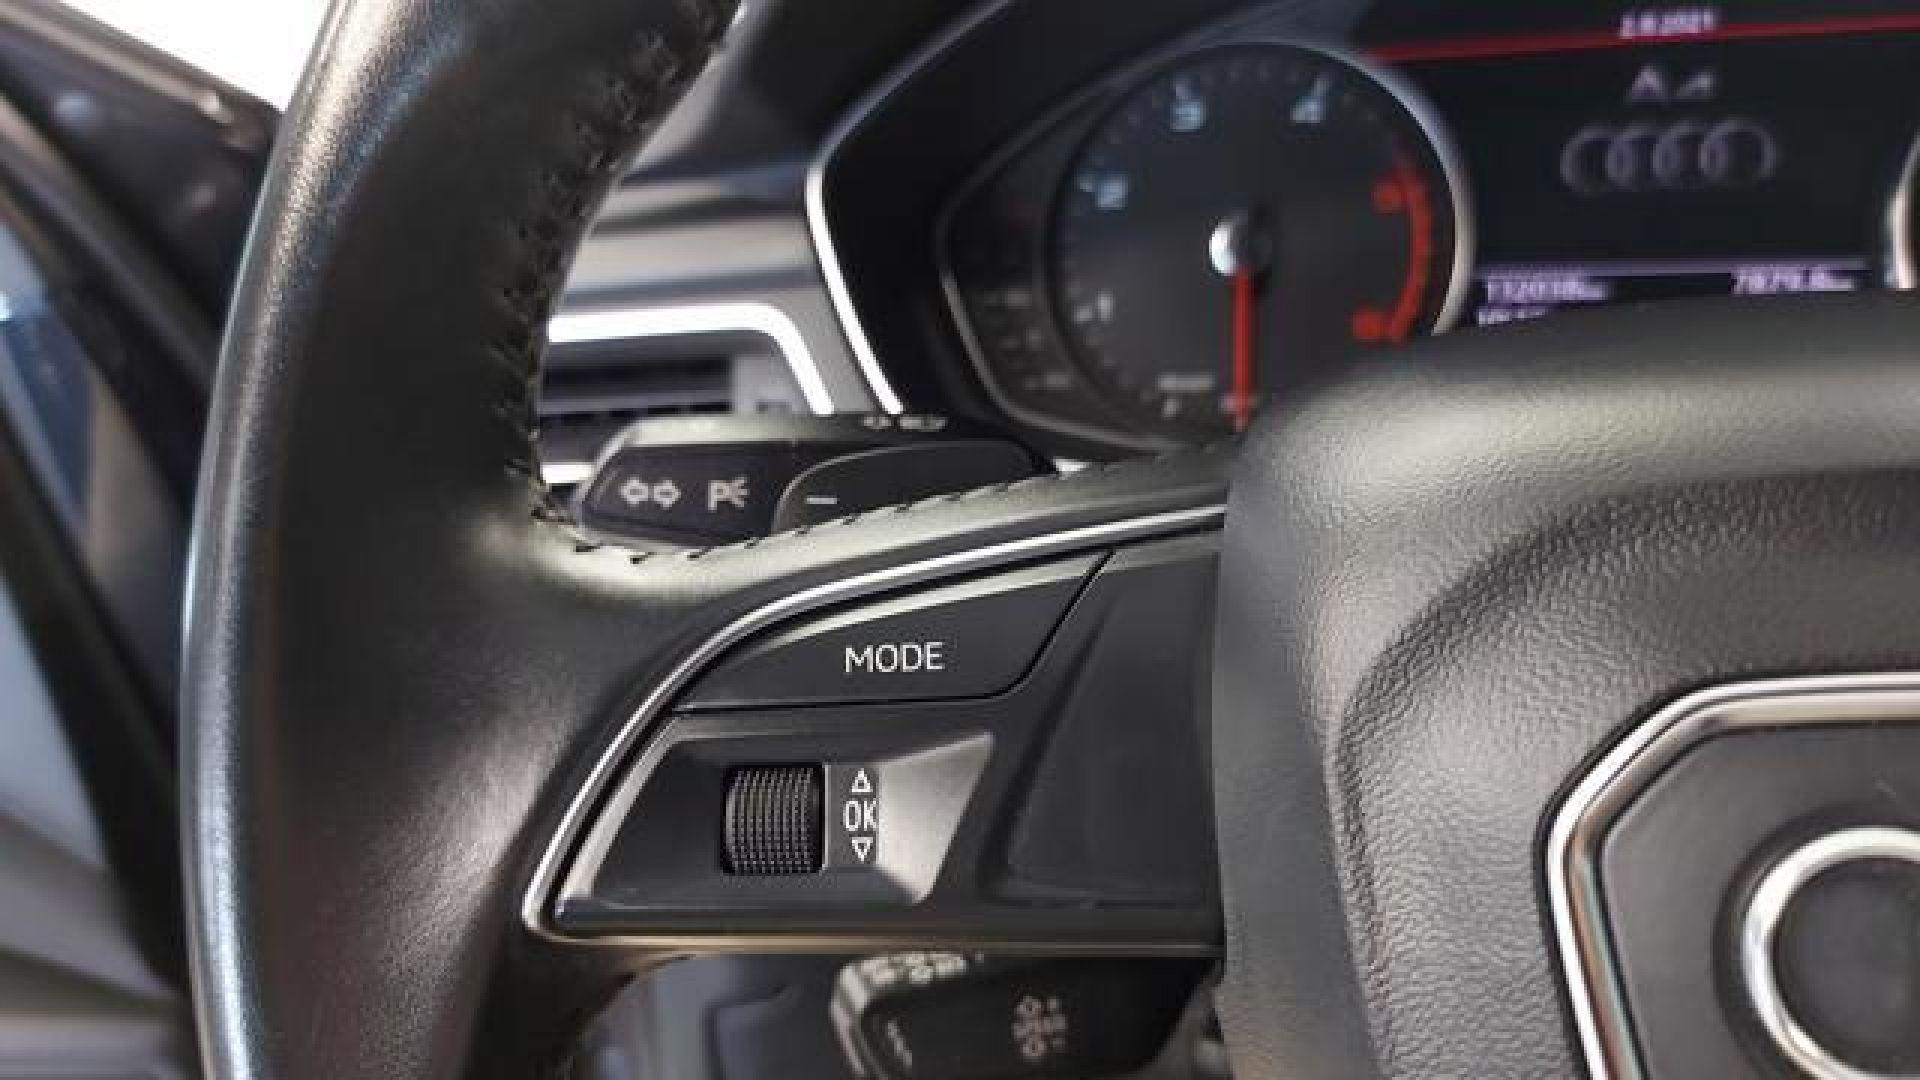 Audi A4 Avant Advanced edition 2.0 TDI ultra 110 kW (150 CV) S tronic